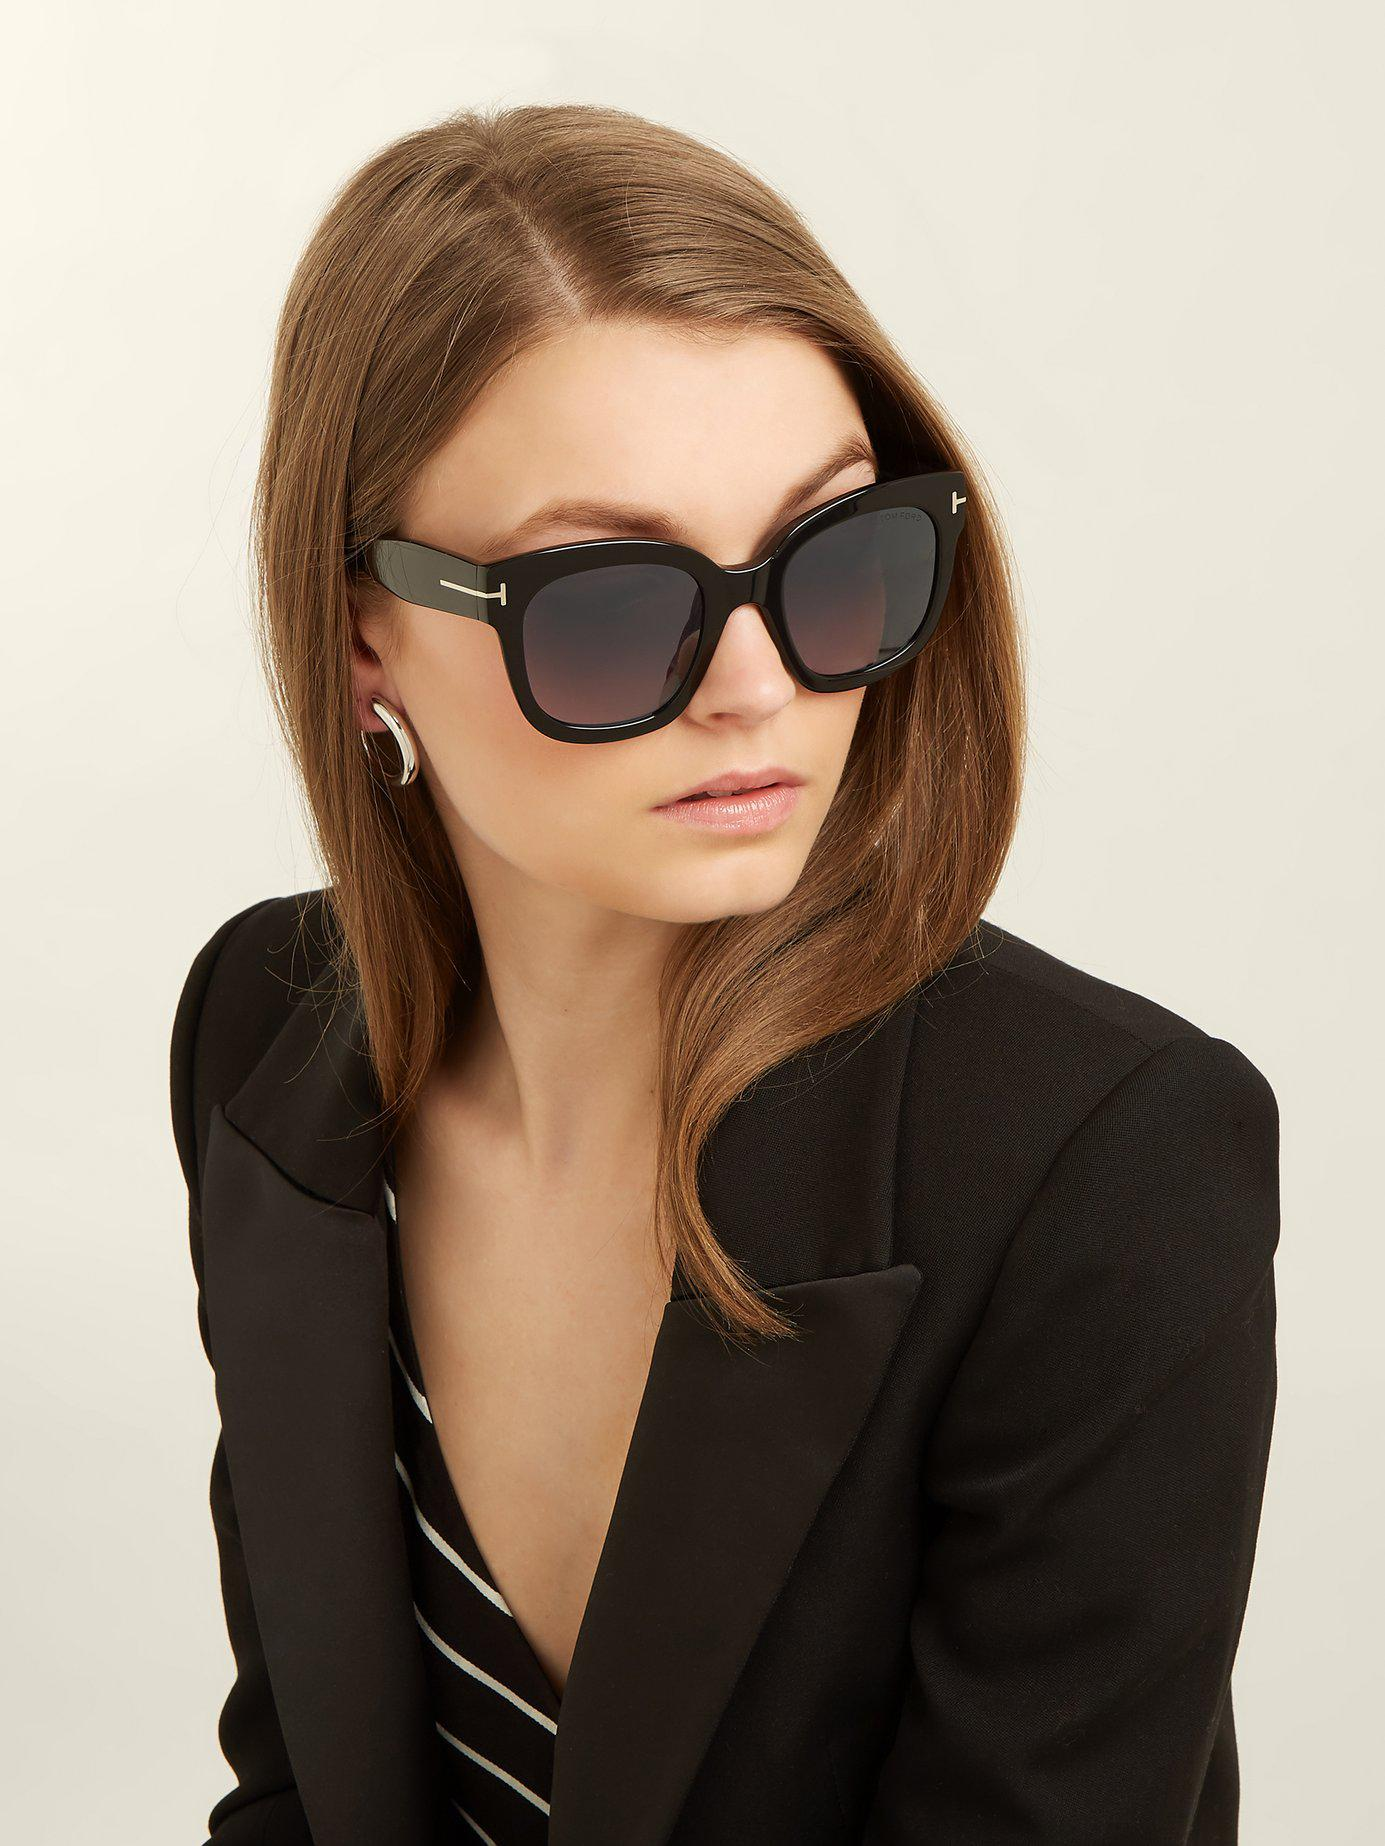 4bcbf973f1 Lyst - Tom Ford Beatrix Square Frame Sunglasses in Black